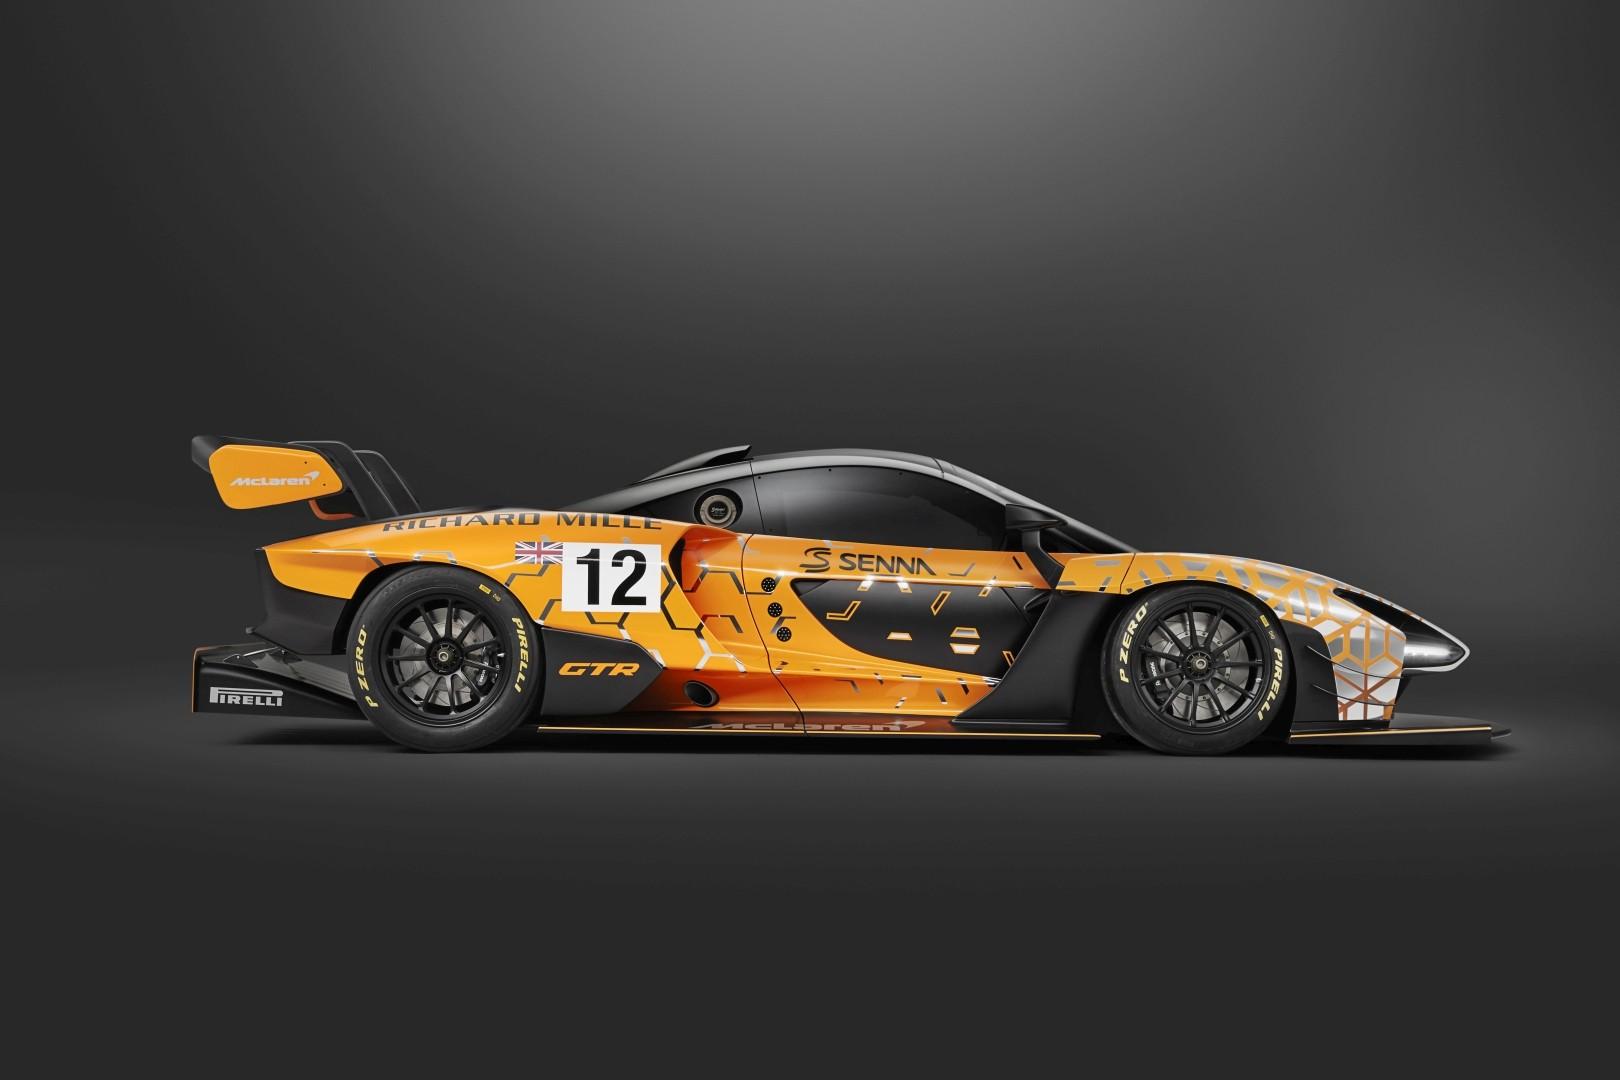 Mclaren Senna Specs >> McLaren Senna GTR Customer Racecar Debuts as Quickest McLaren Outside F1 - autoevolution